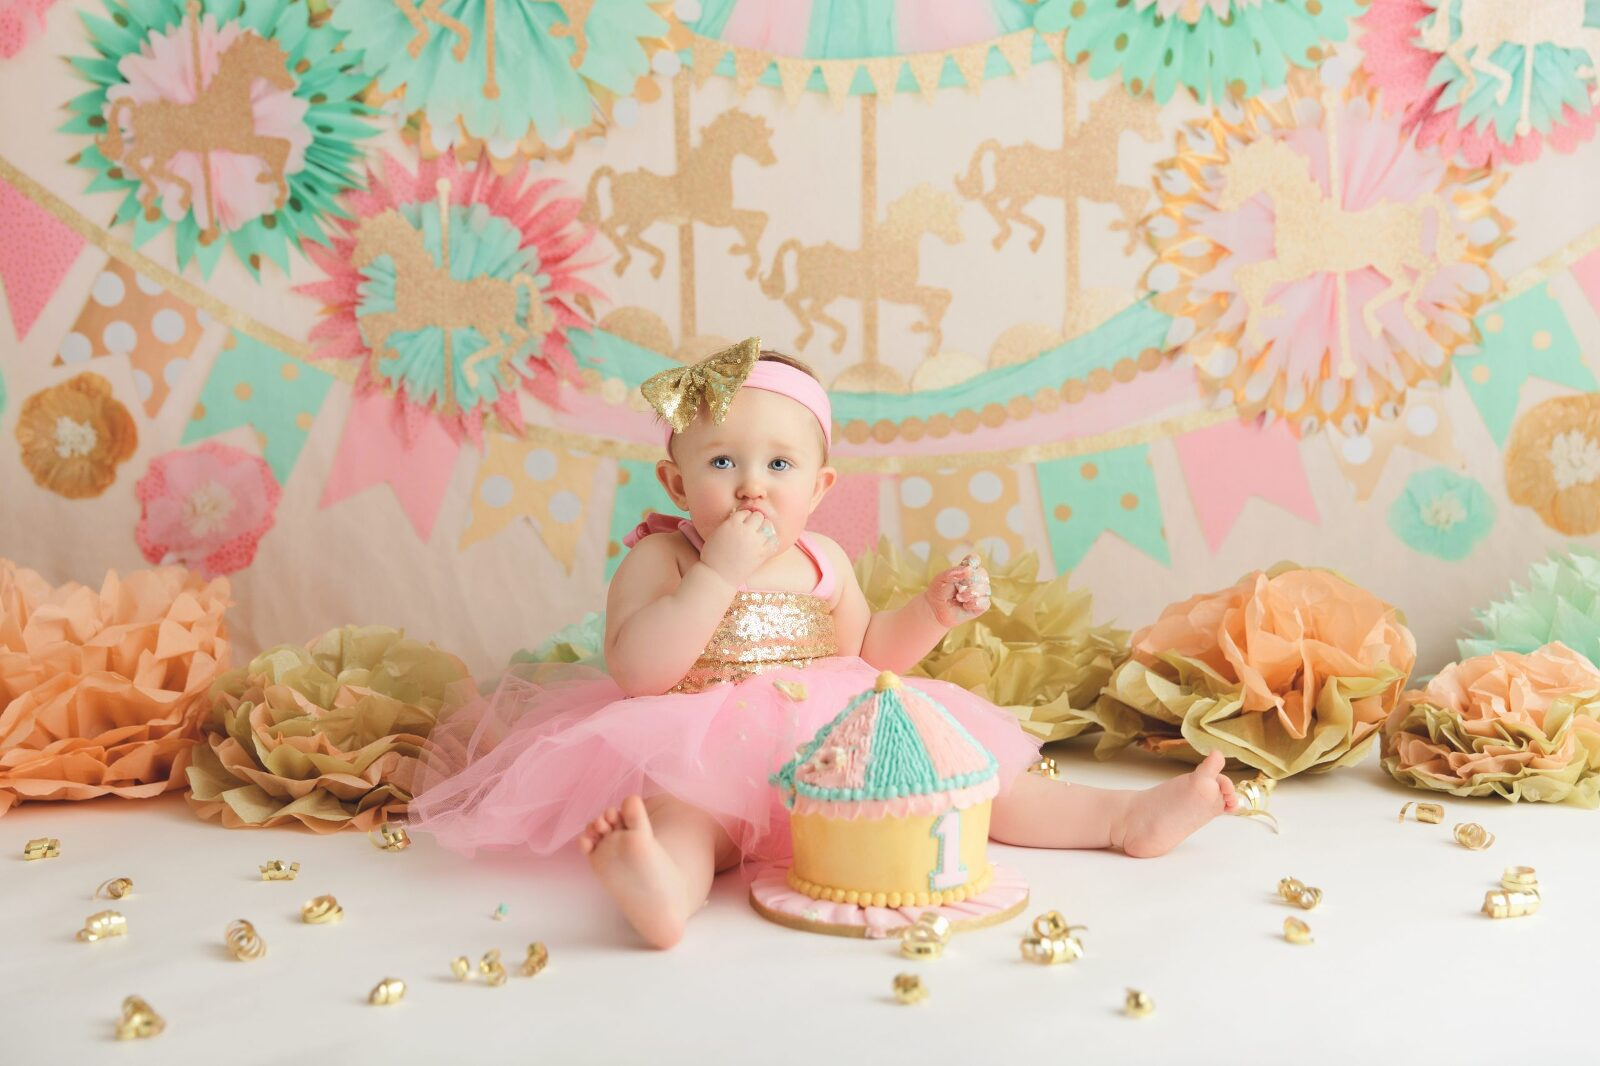 circus theme, cake smash, teal, pink, cake